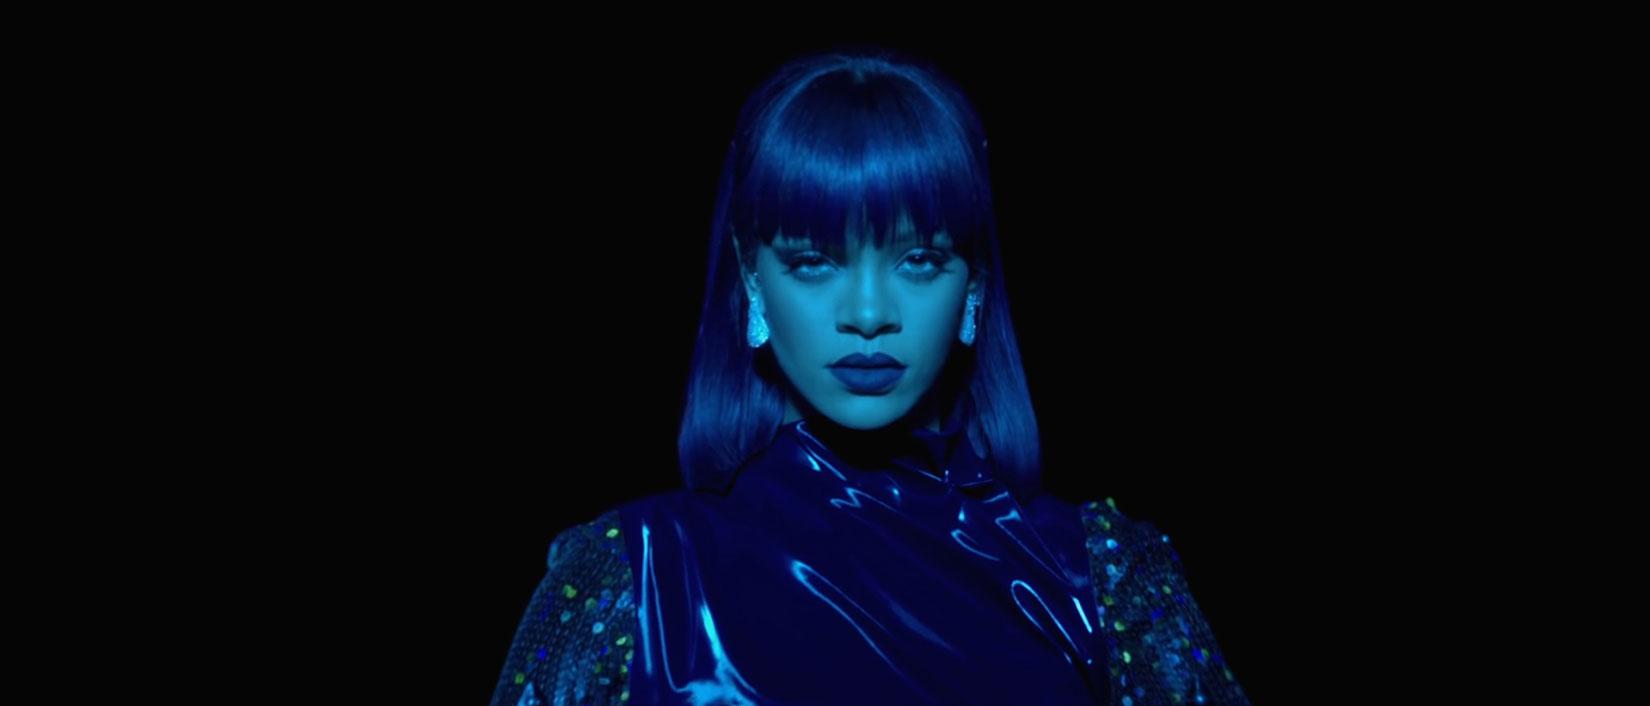 Rihanna_ANTI_diaRy_5